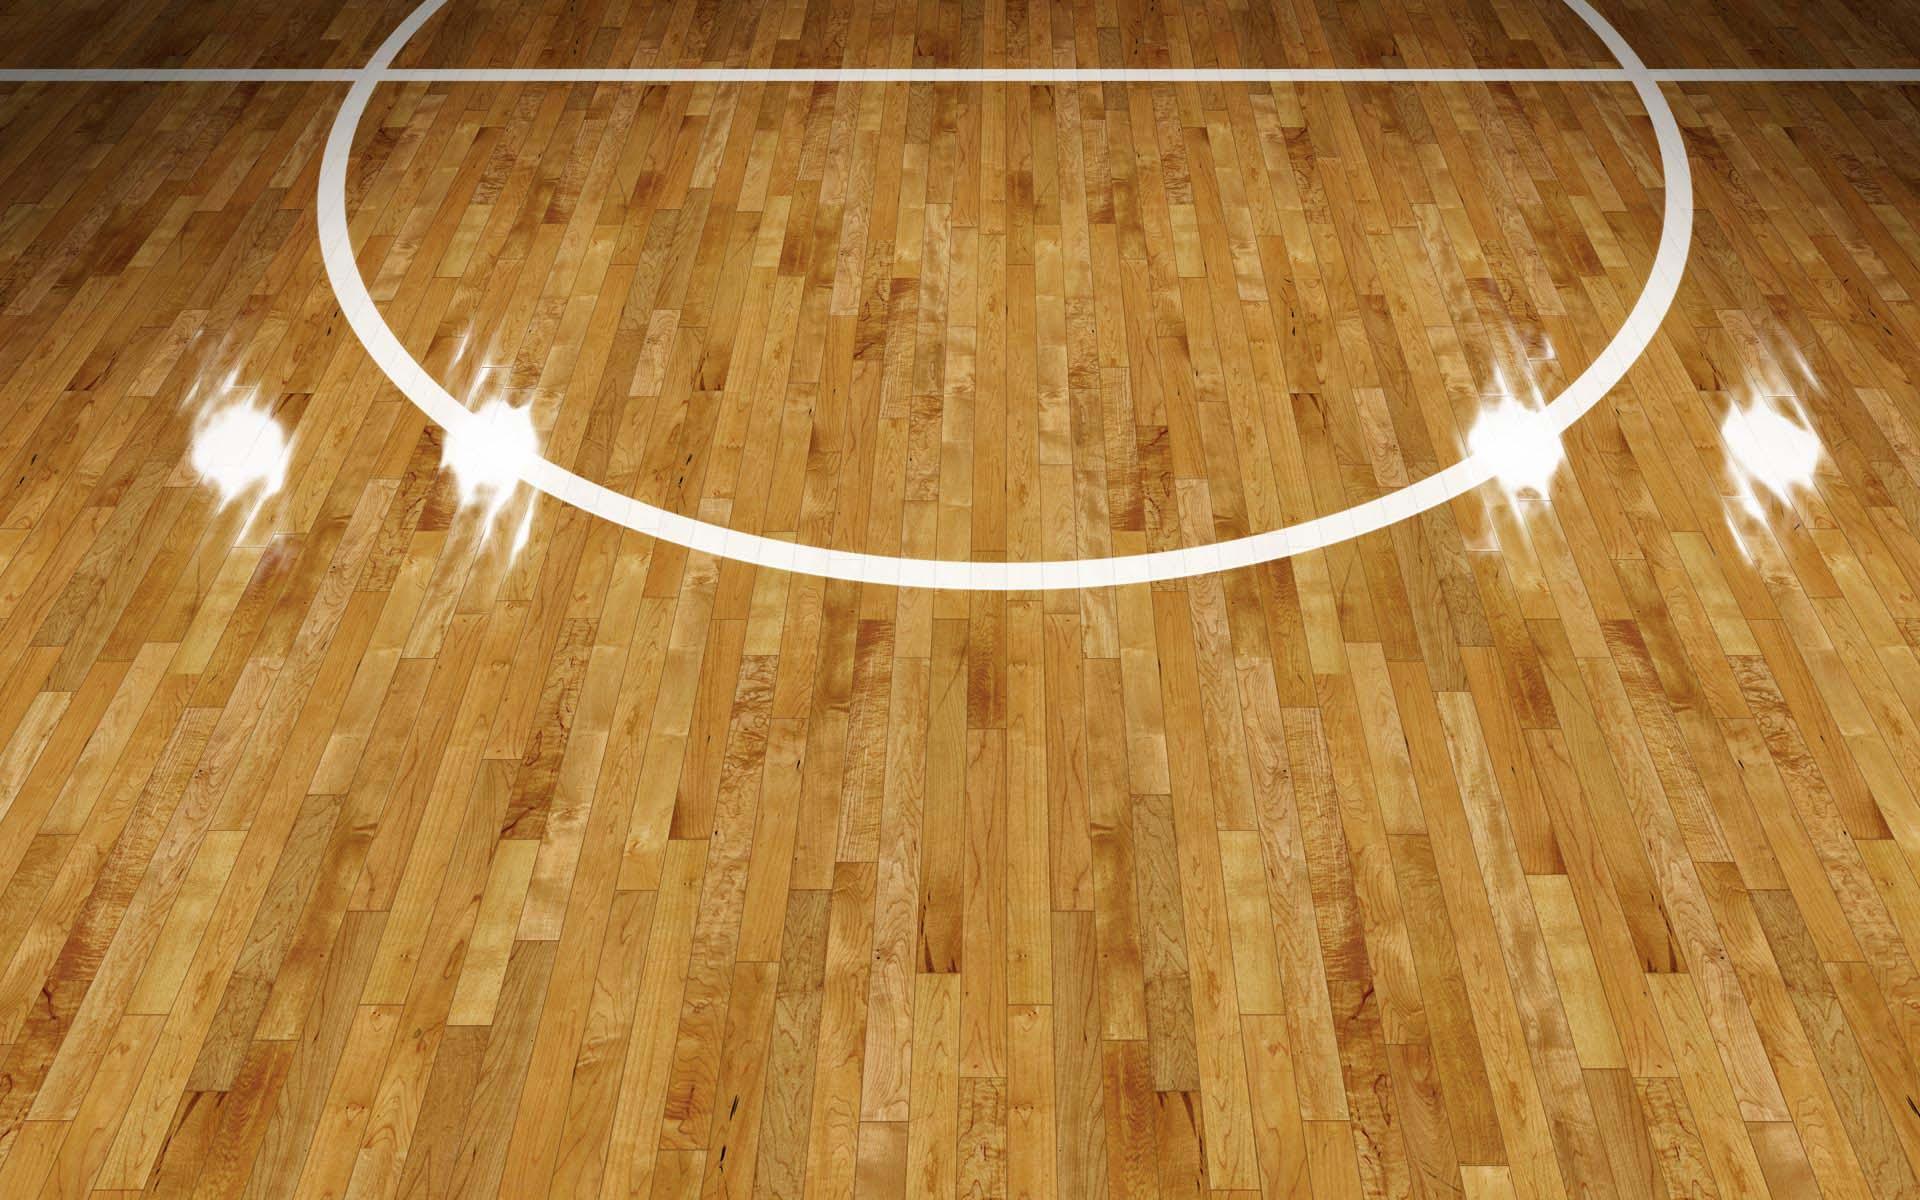 floor education basketball kacpano courts community floors activity description node center gym hs kennedy